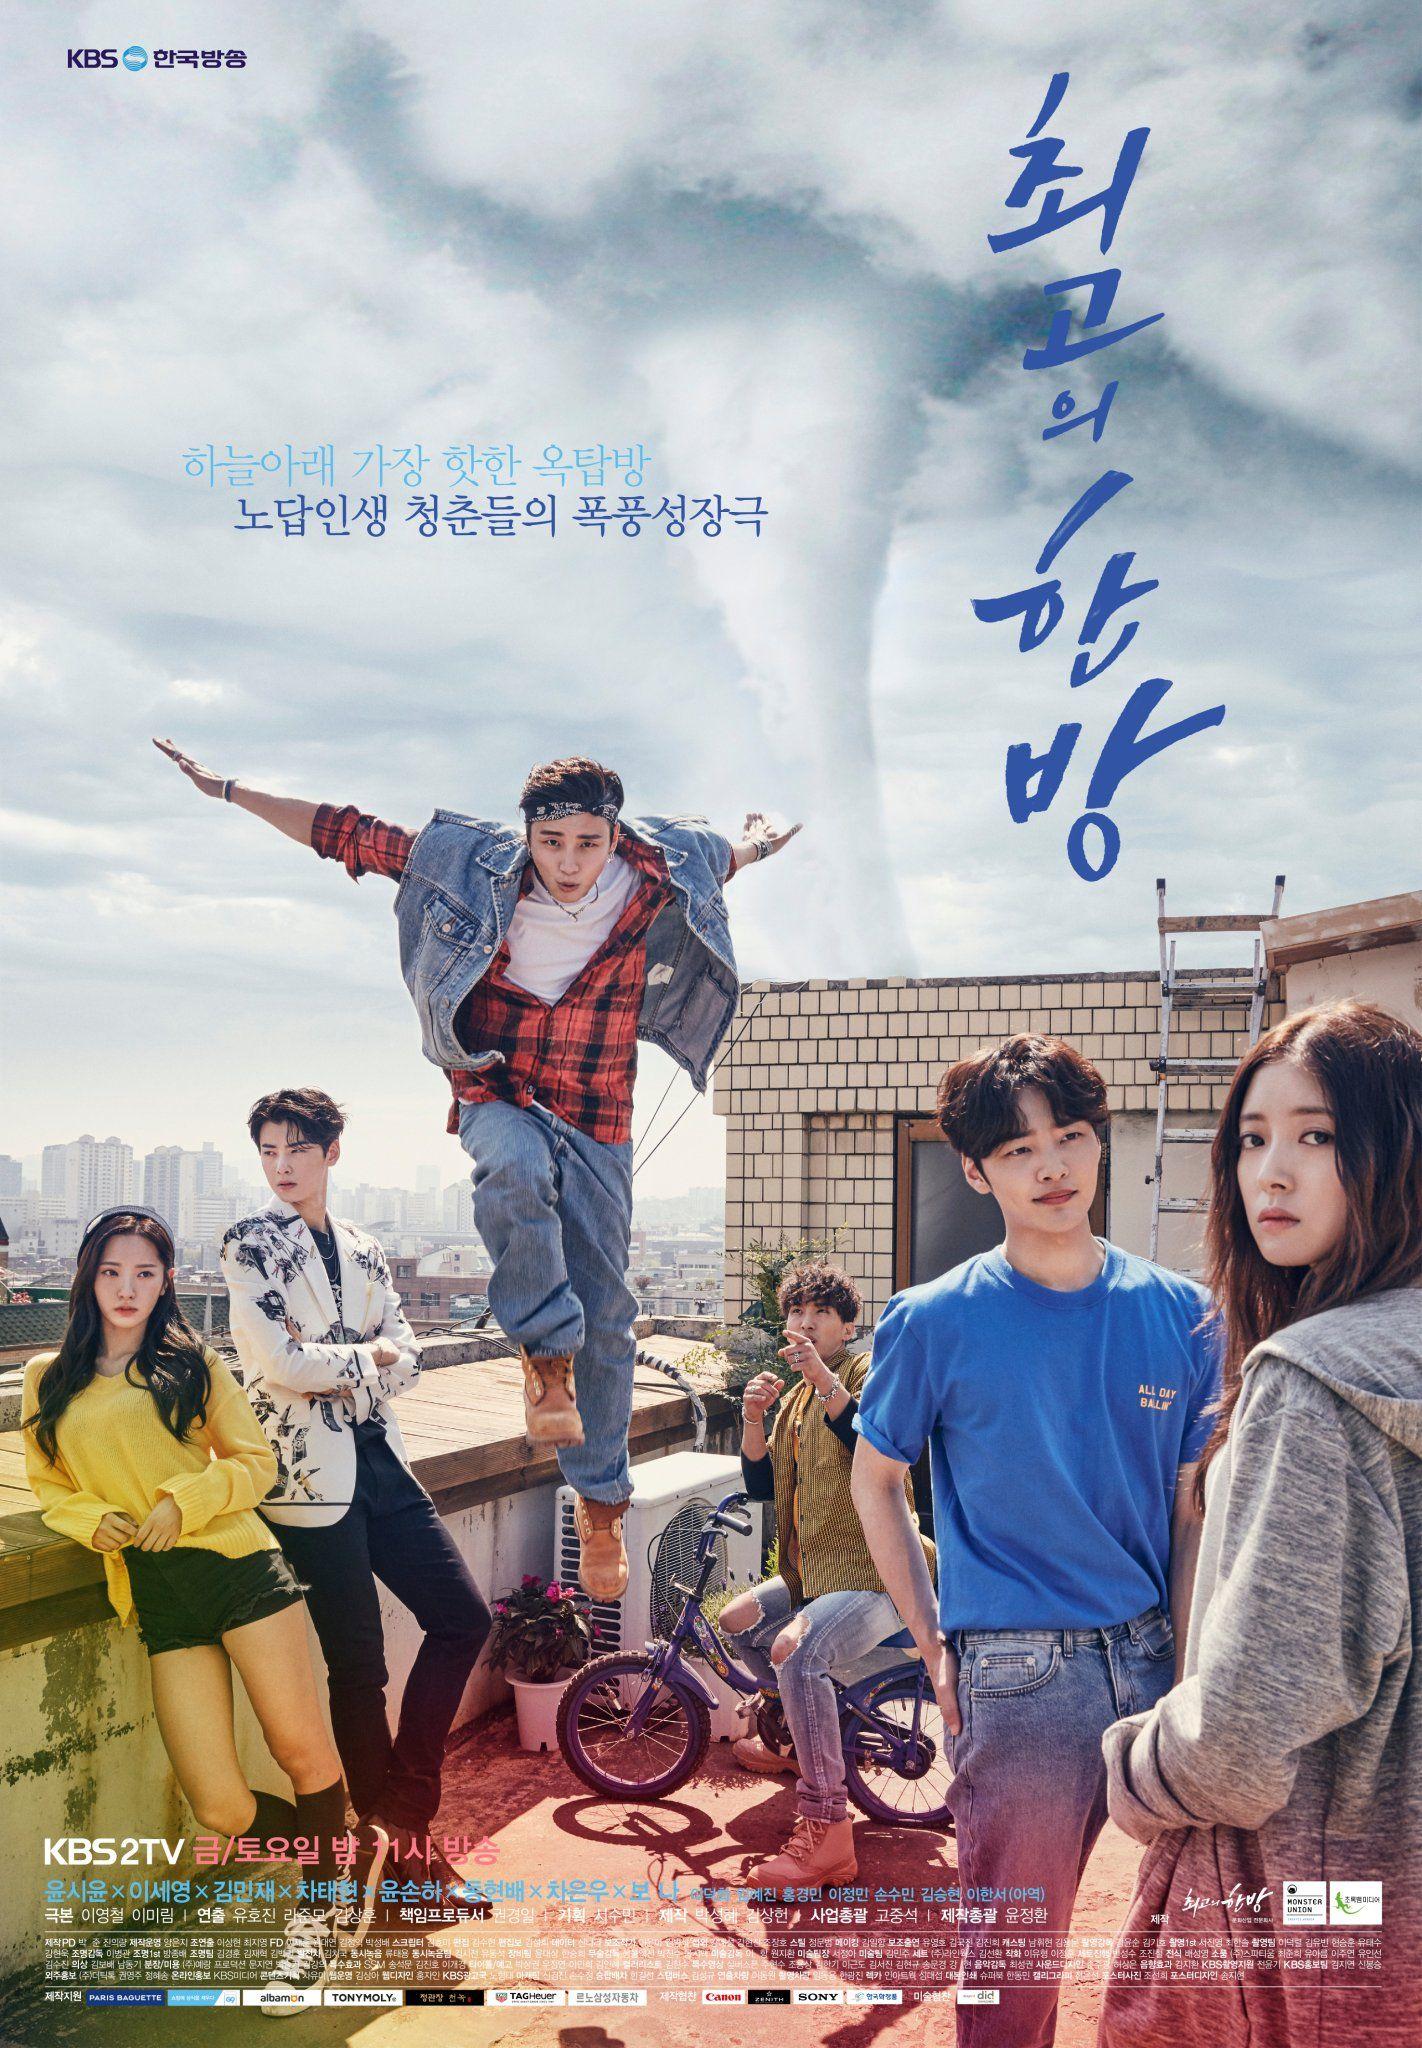 Drama Korea Viu 2019 : drama, korea, Thailand, Twitter, Drama,, Drama, Korea,, Bagus